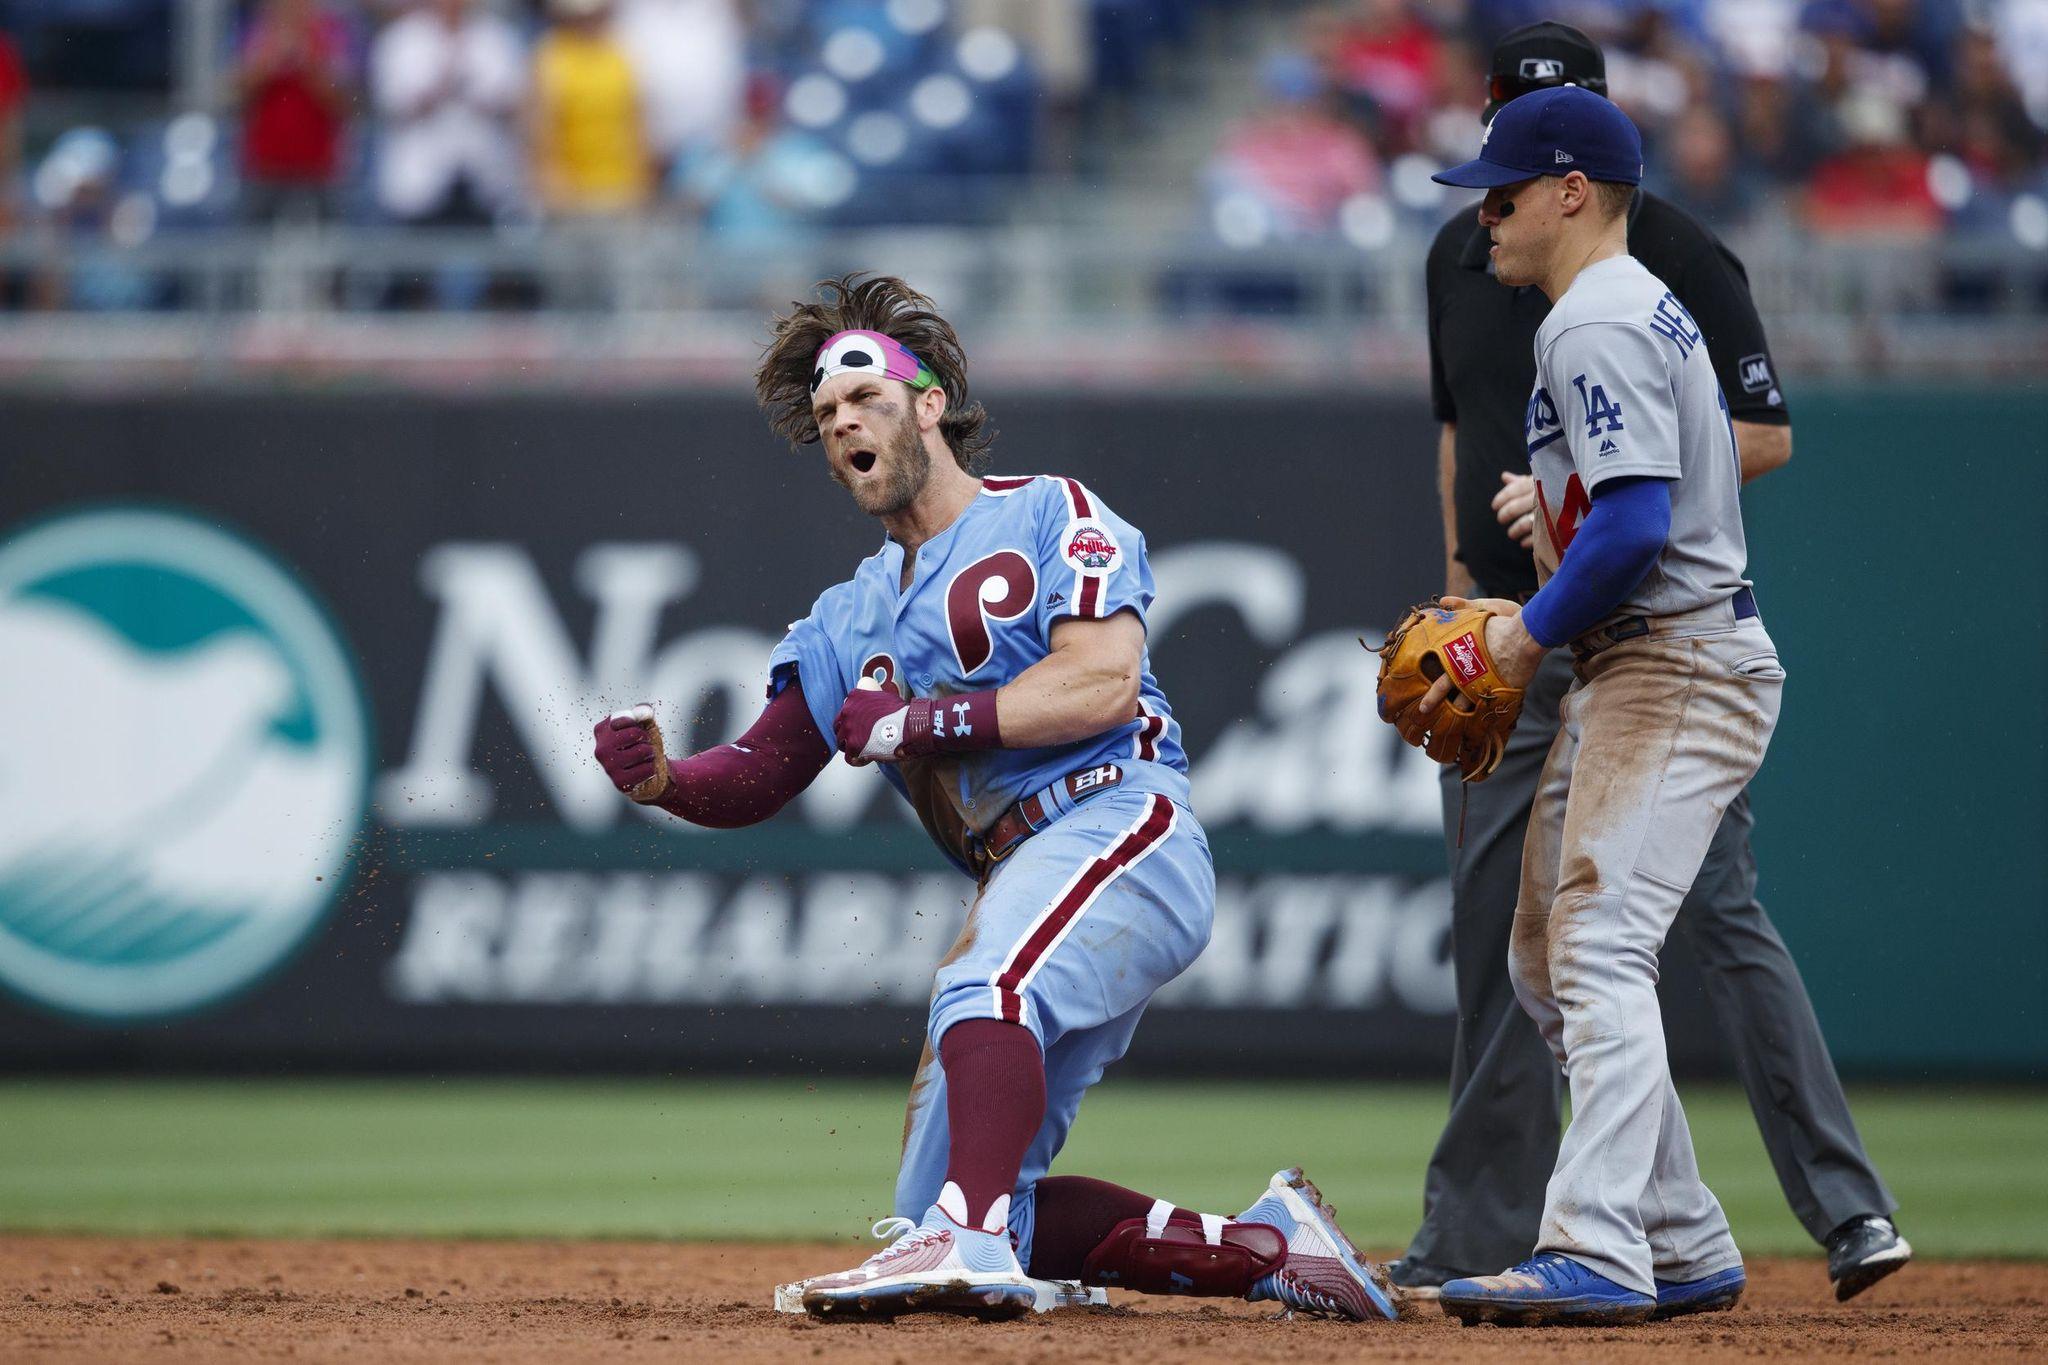 Dodgers_phillies_baseball_21879_s2048x1365